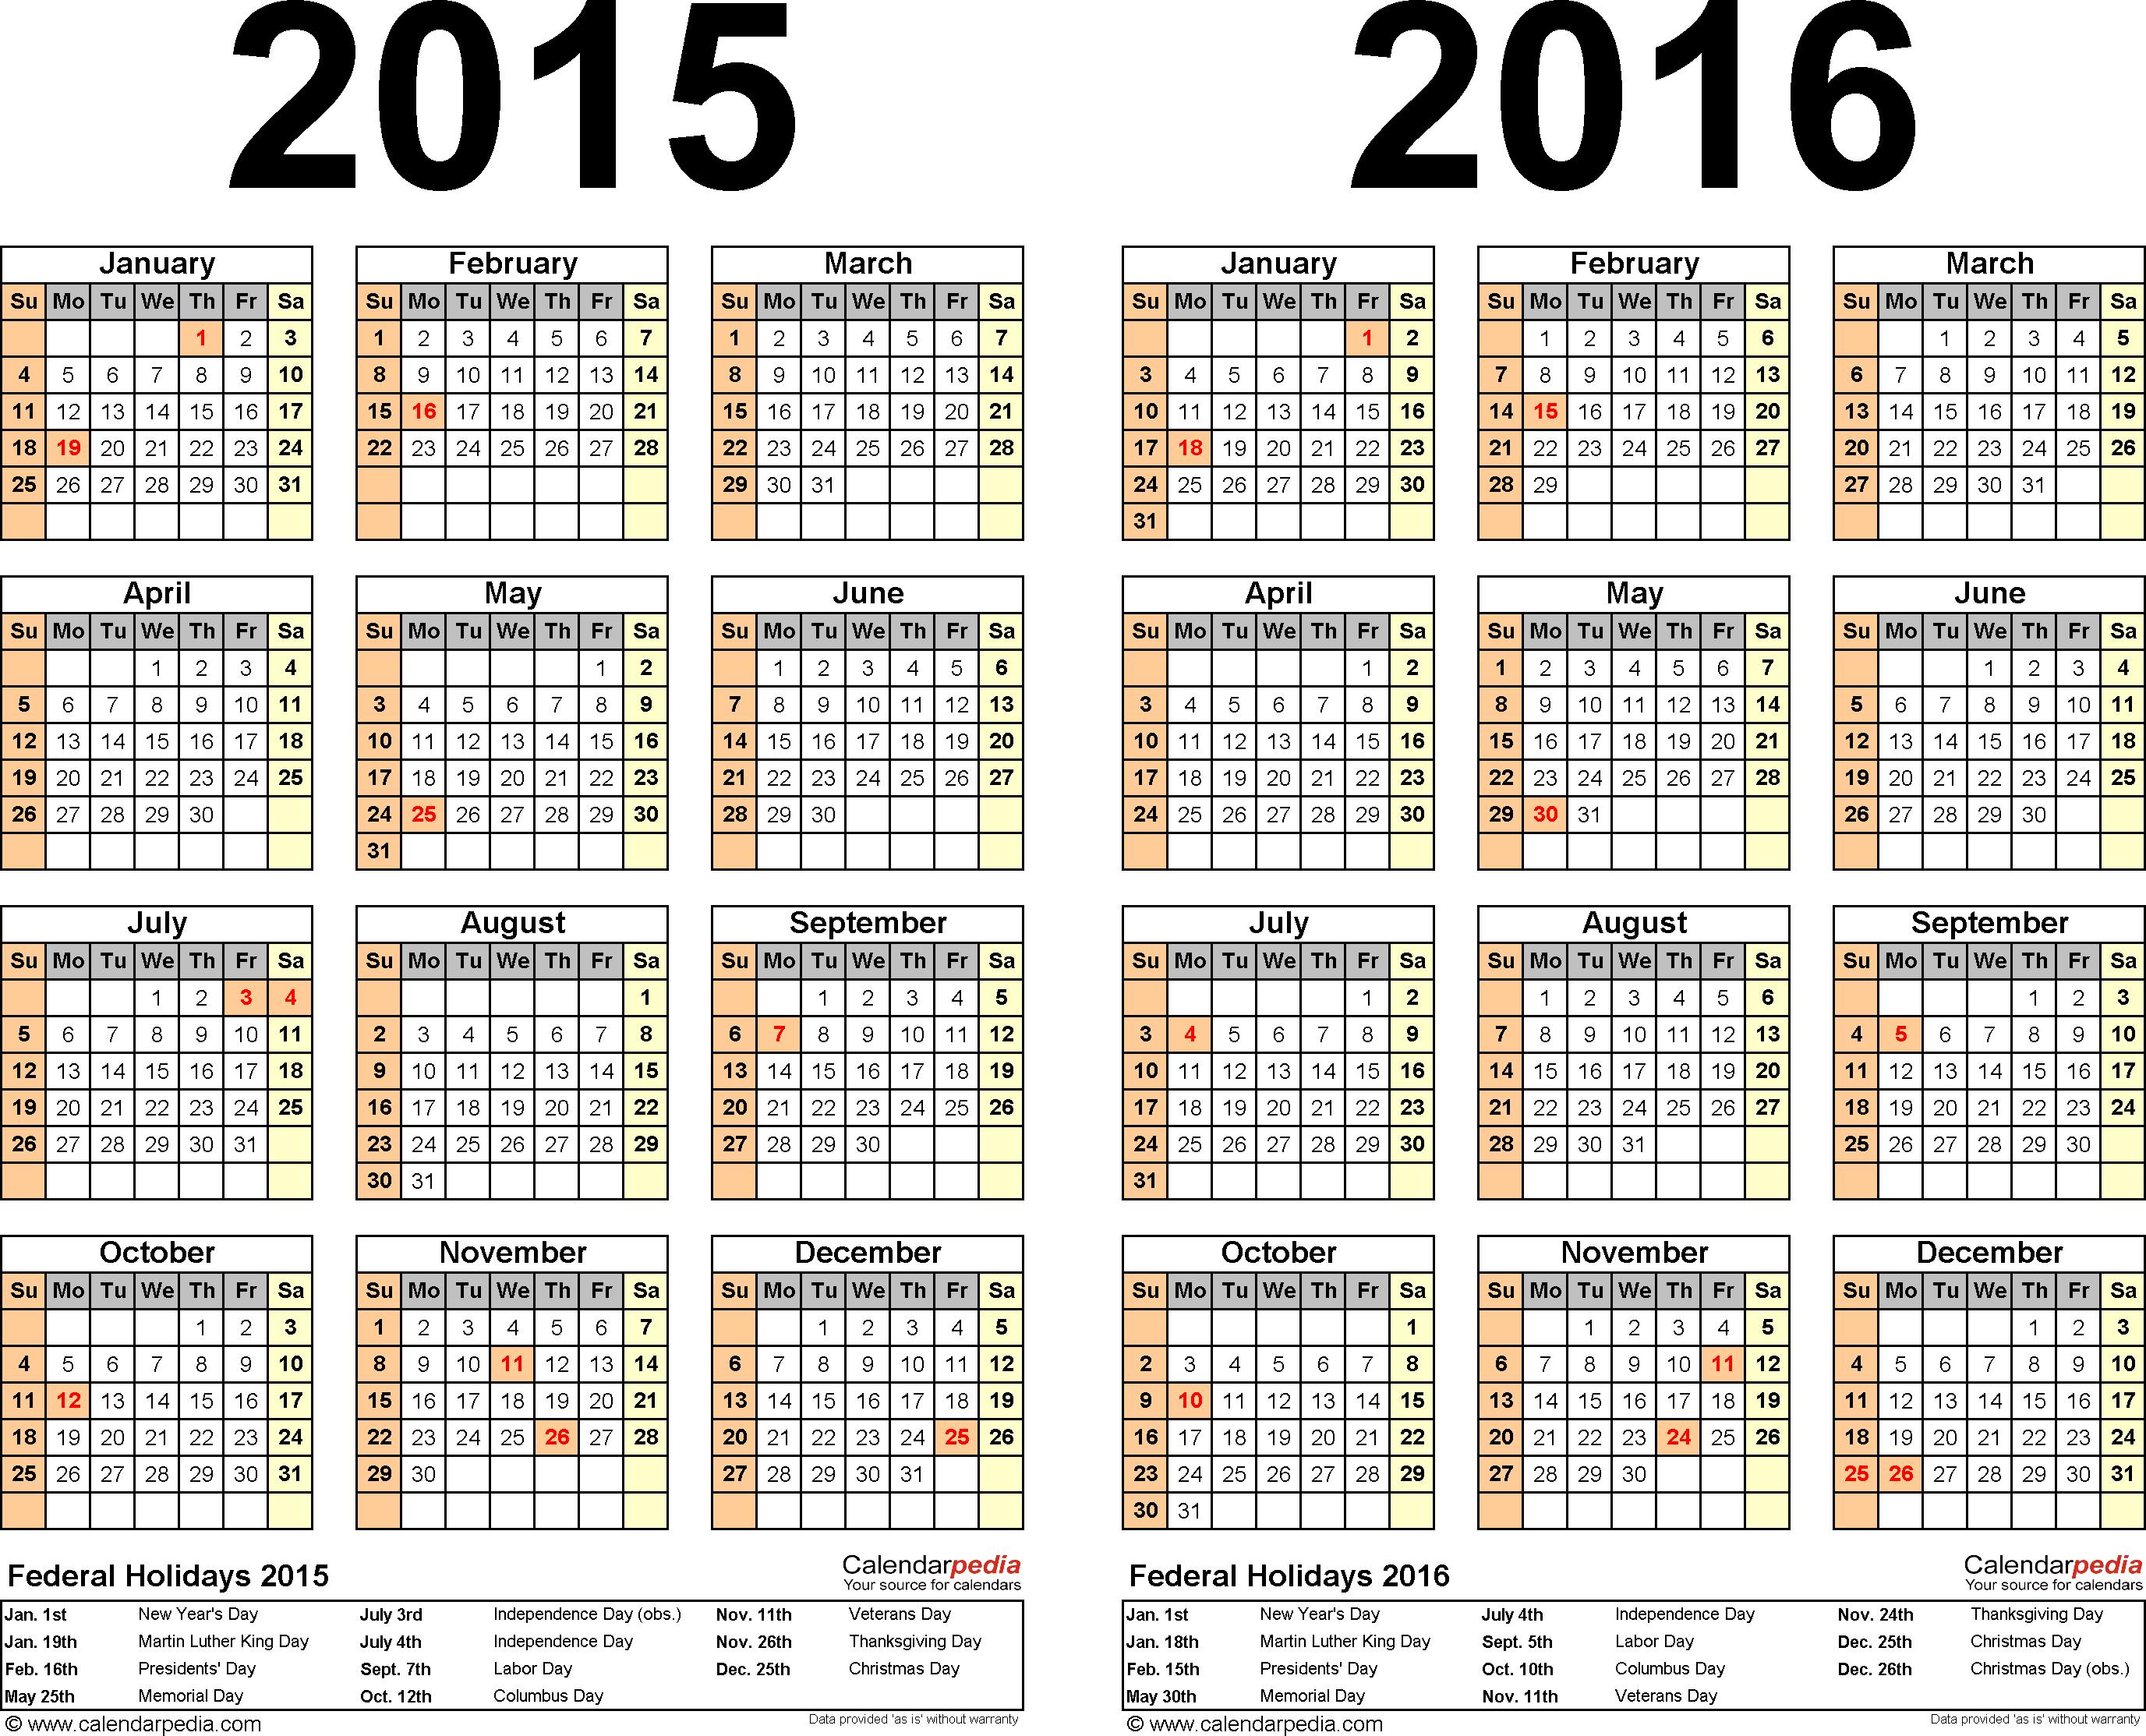 2015-2016 Calendar - Free Printable Two-Year Word Calendars - Free Printable Diary 2015